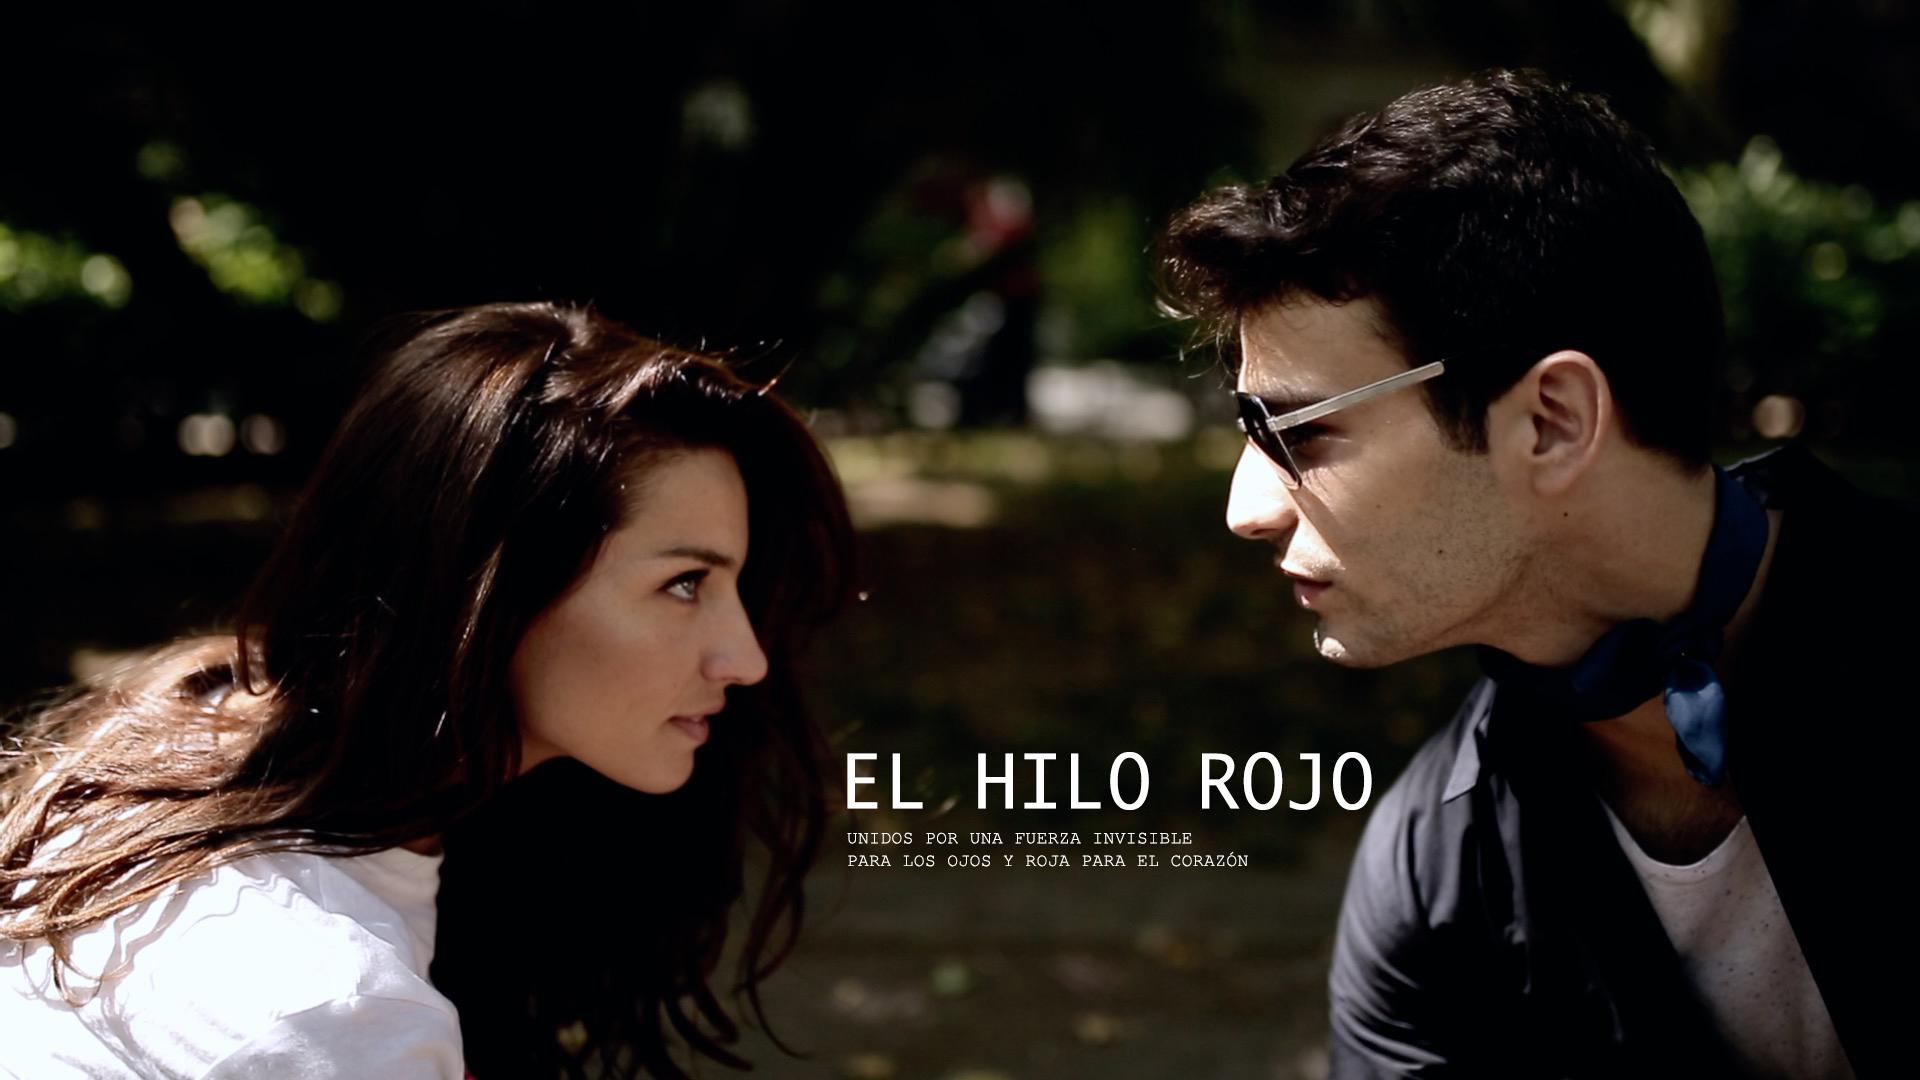 Fénix Visual, El Hilo Rojo, Inspirational Wedding, videografo de bodas,